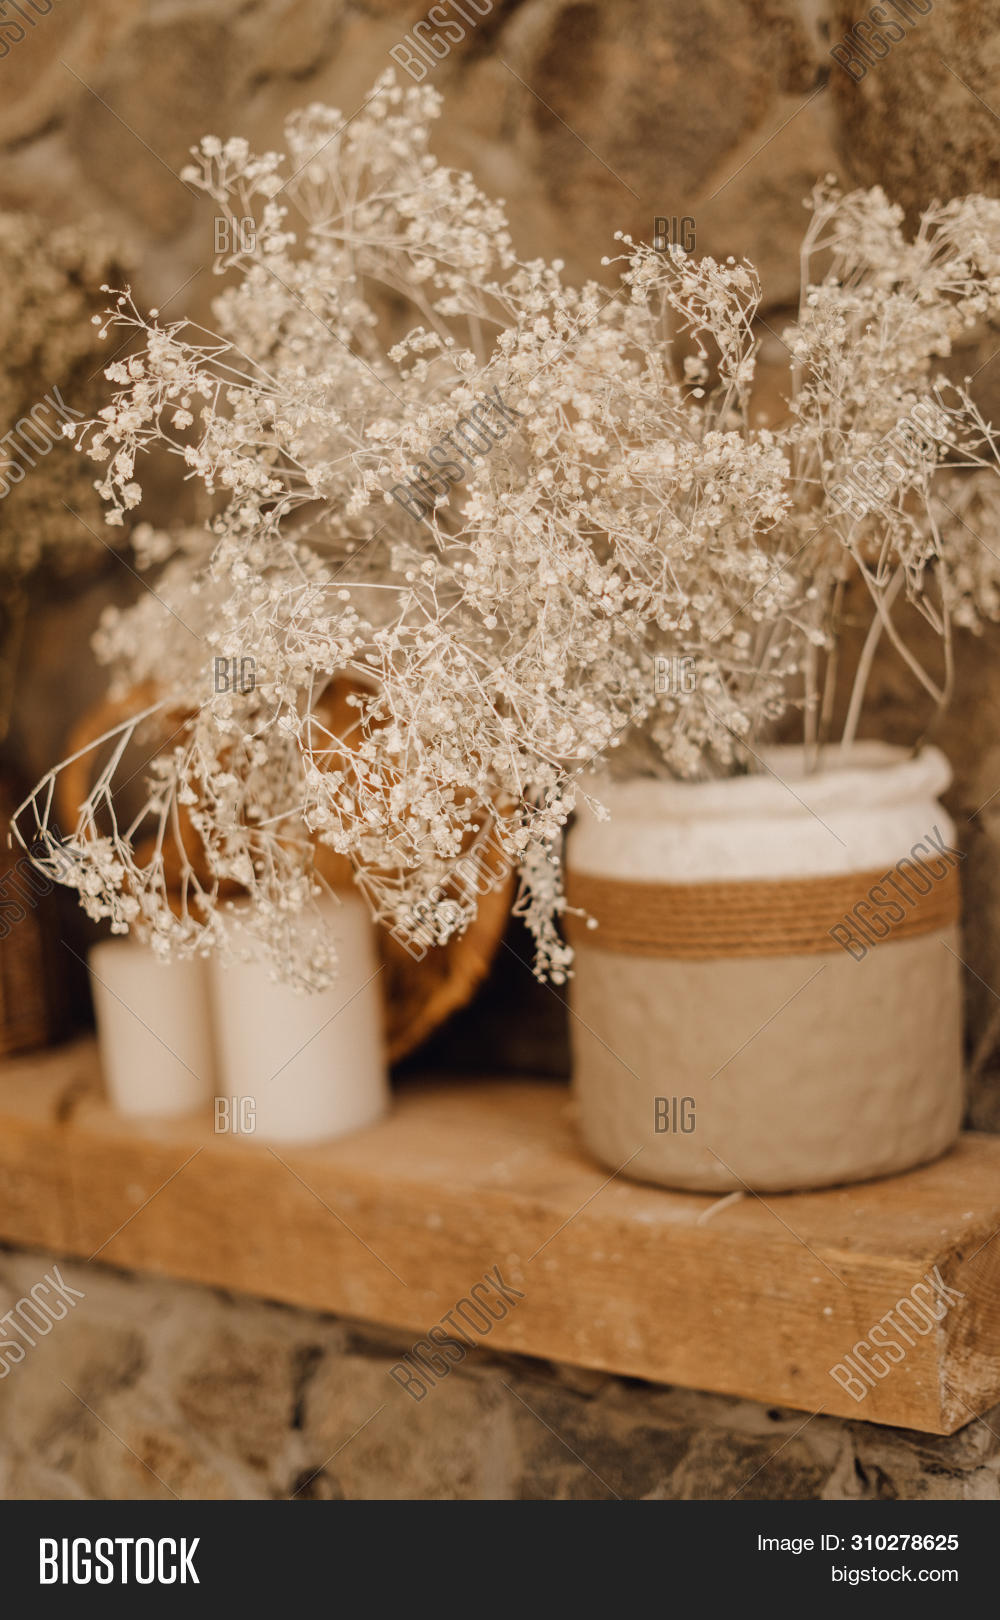 Dry Flower Rustic Vase Image Photo Free Trial Bigstock